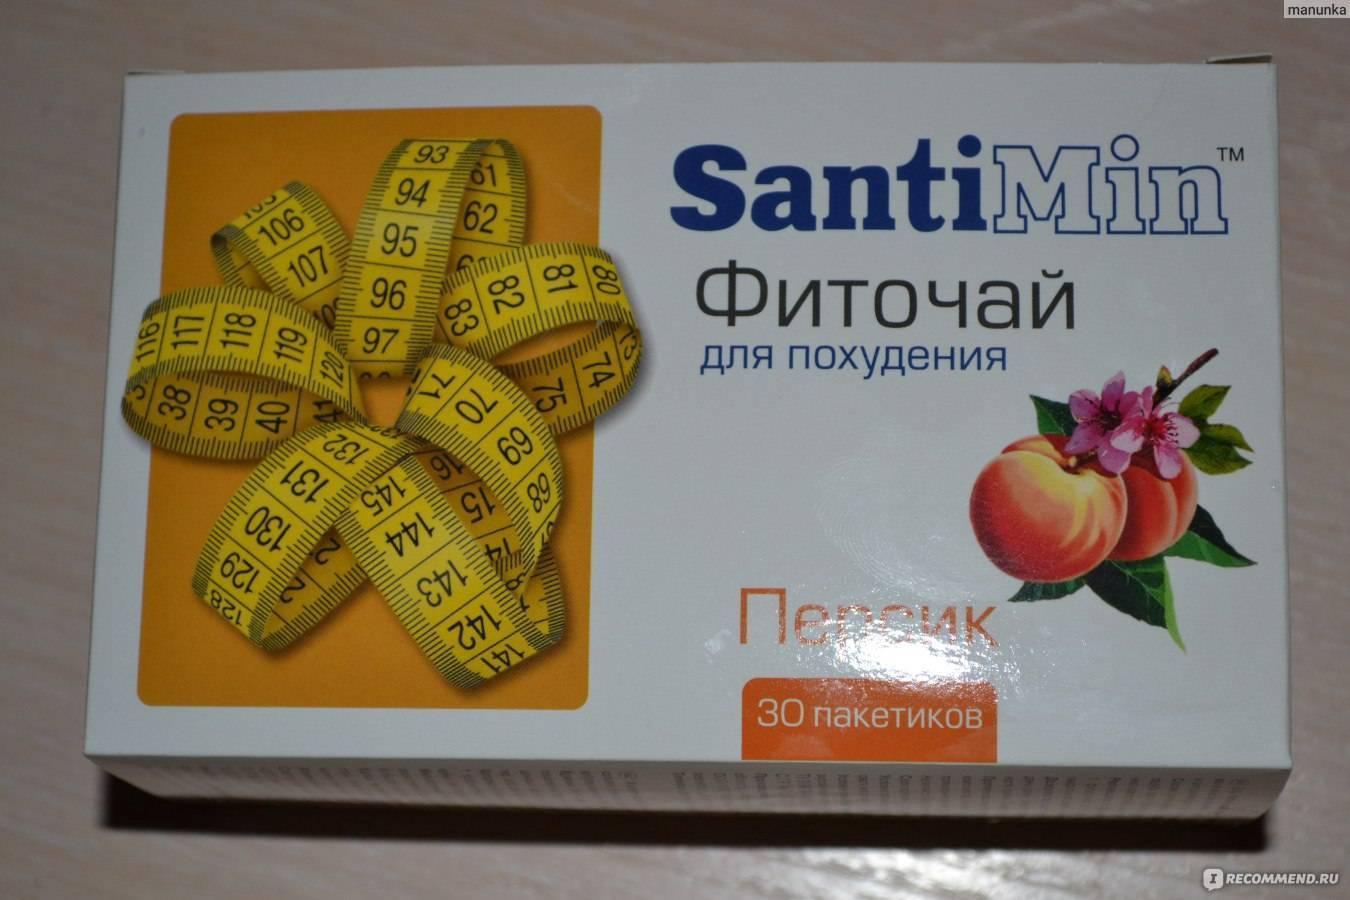 Santimin